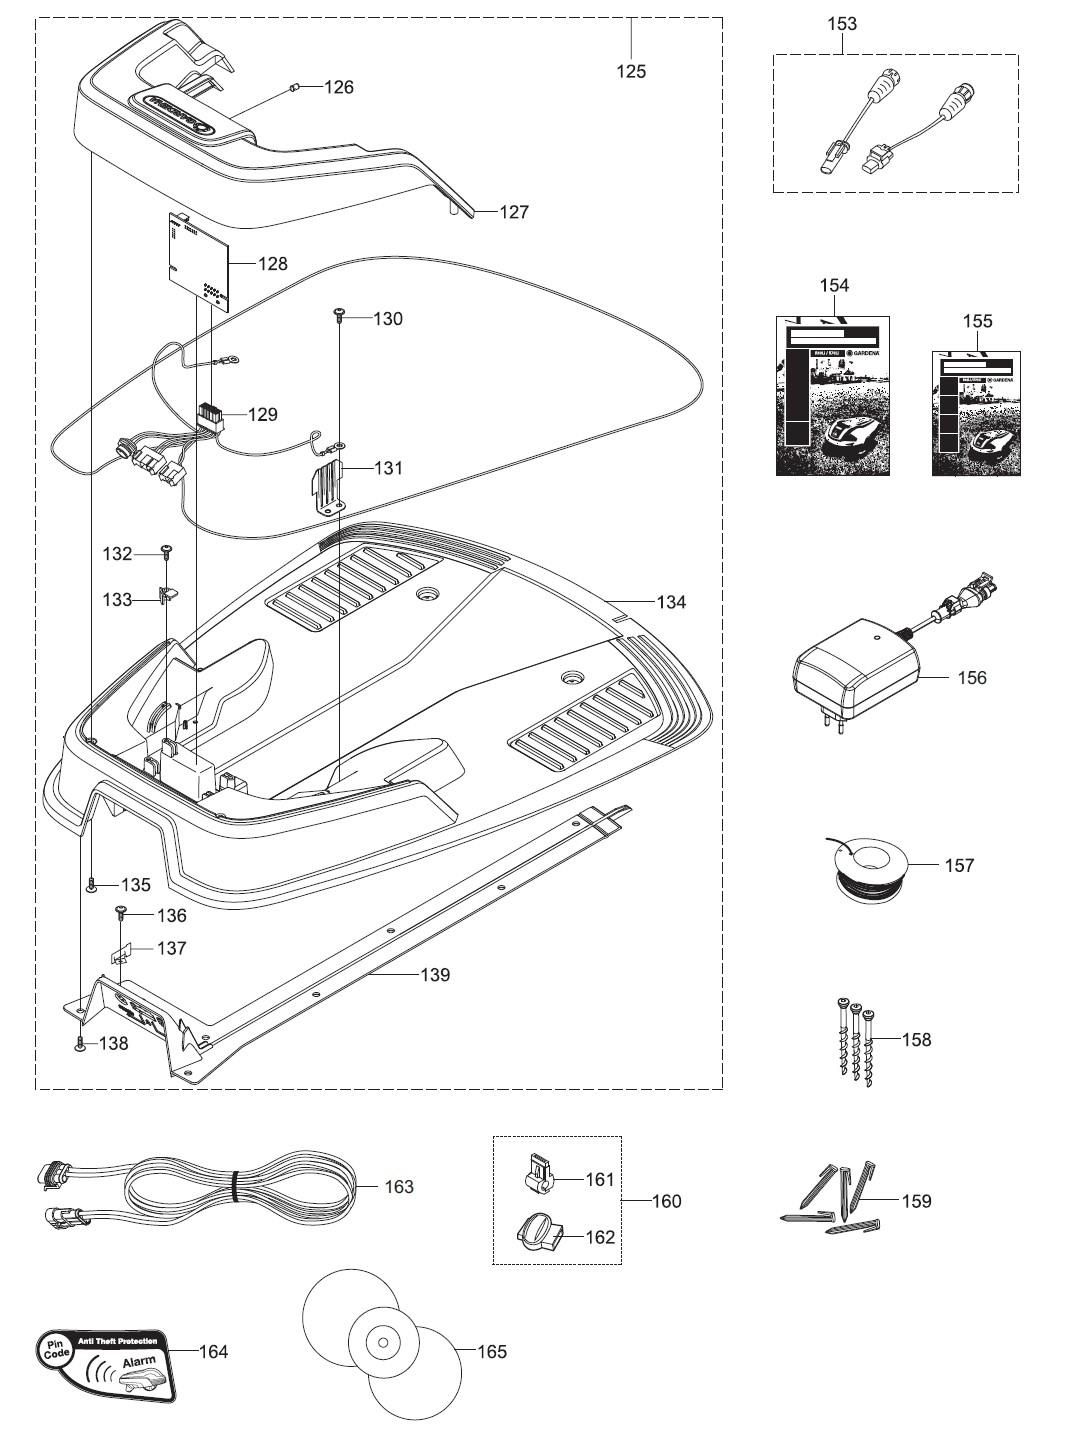 gardena ersatzteile ladestation m hroboter r38li 4071 35 bj nov 2013 2015 seriennummer. Black Bedroom Furniture Sets. Home Design Ideas